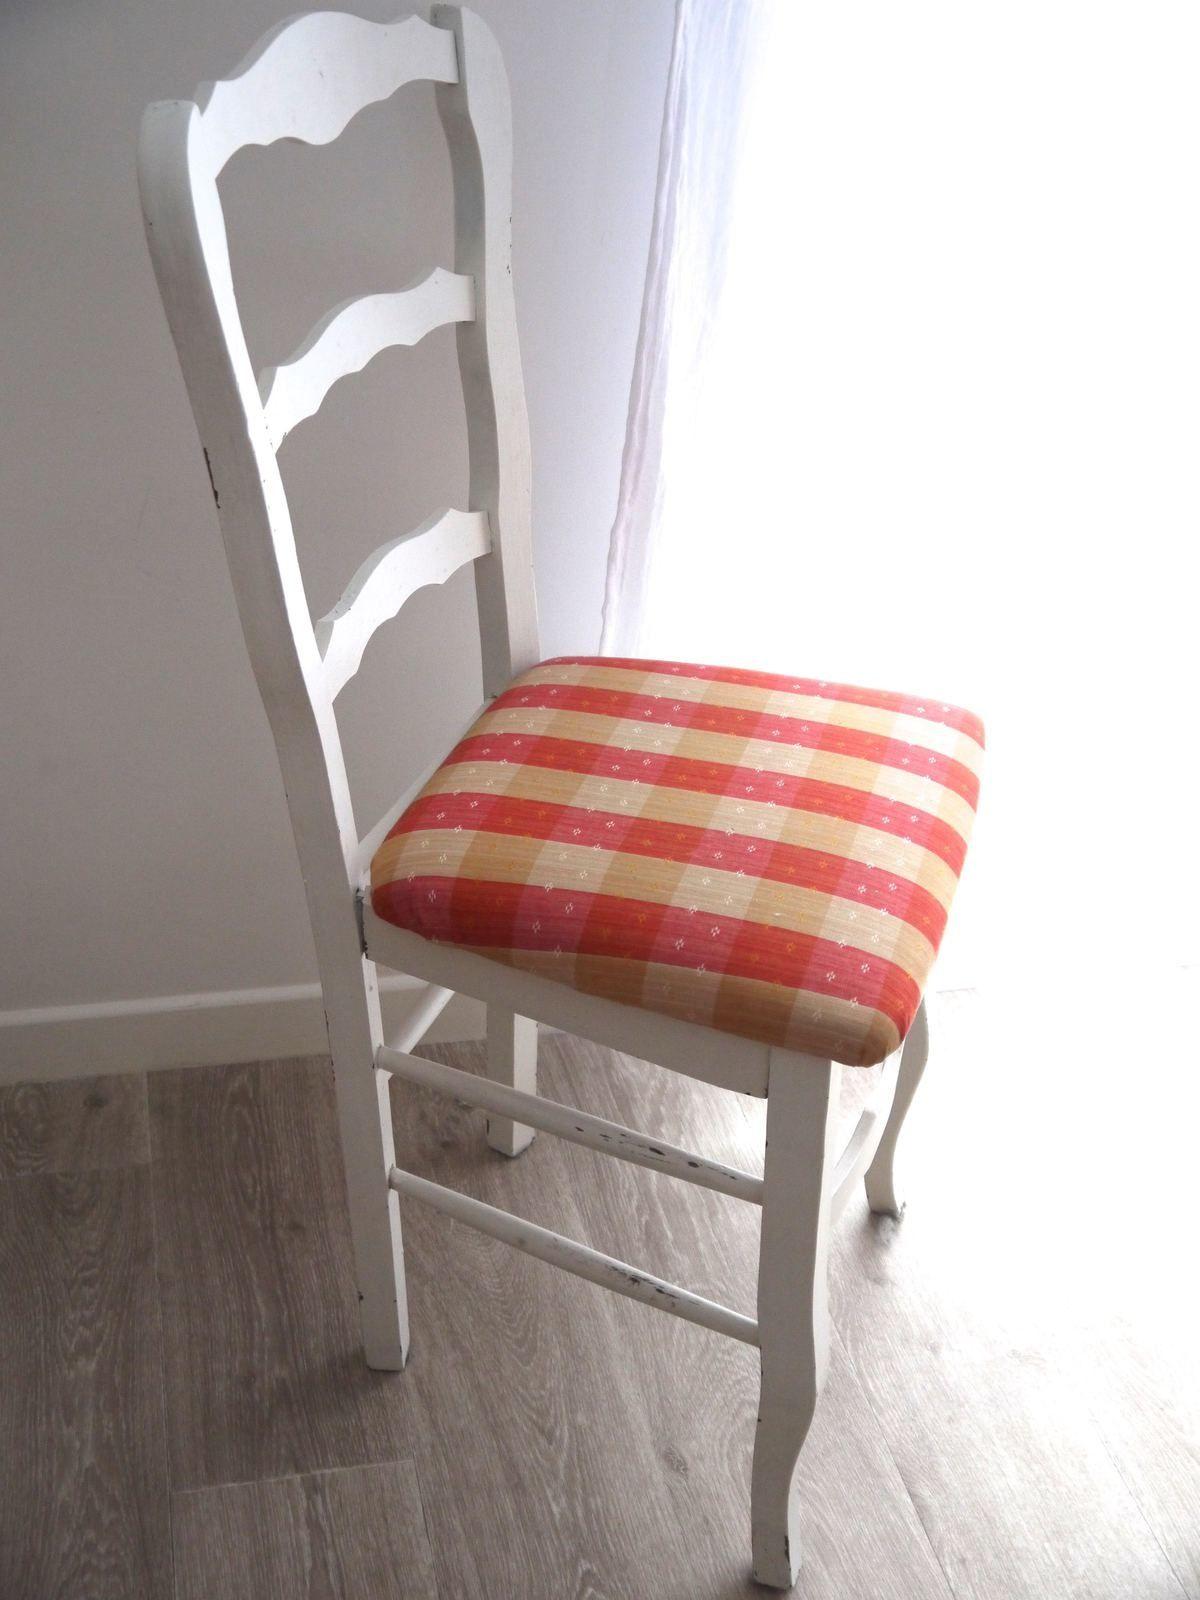 Comment Restaurer Une Chaise En Bois restaurer une chaise en bois - diy bricolage | chaises bois